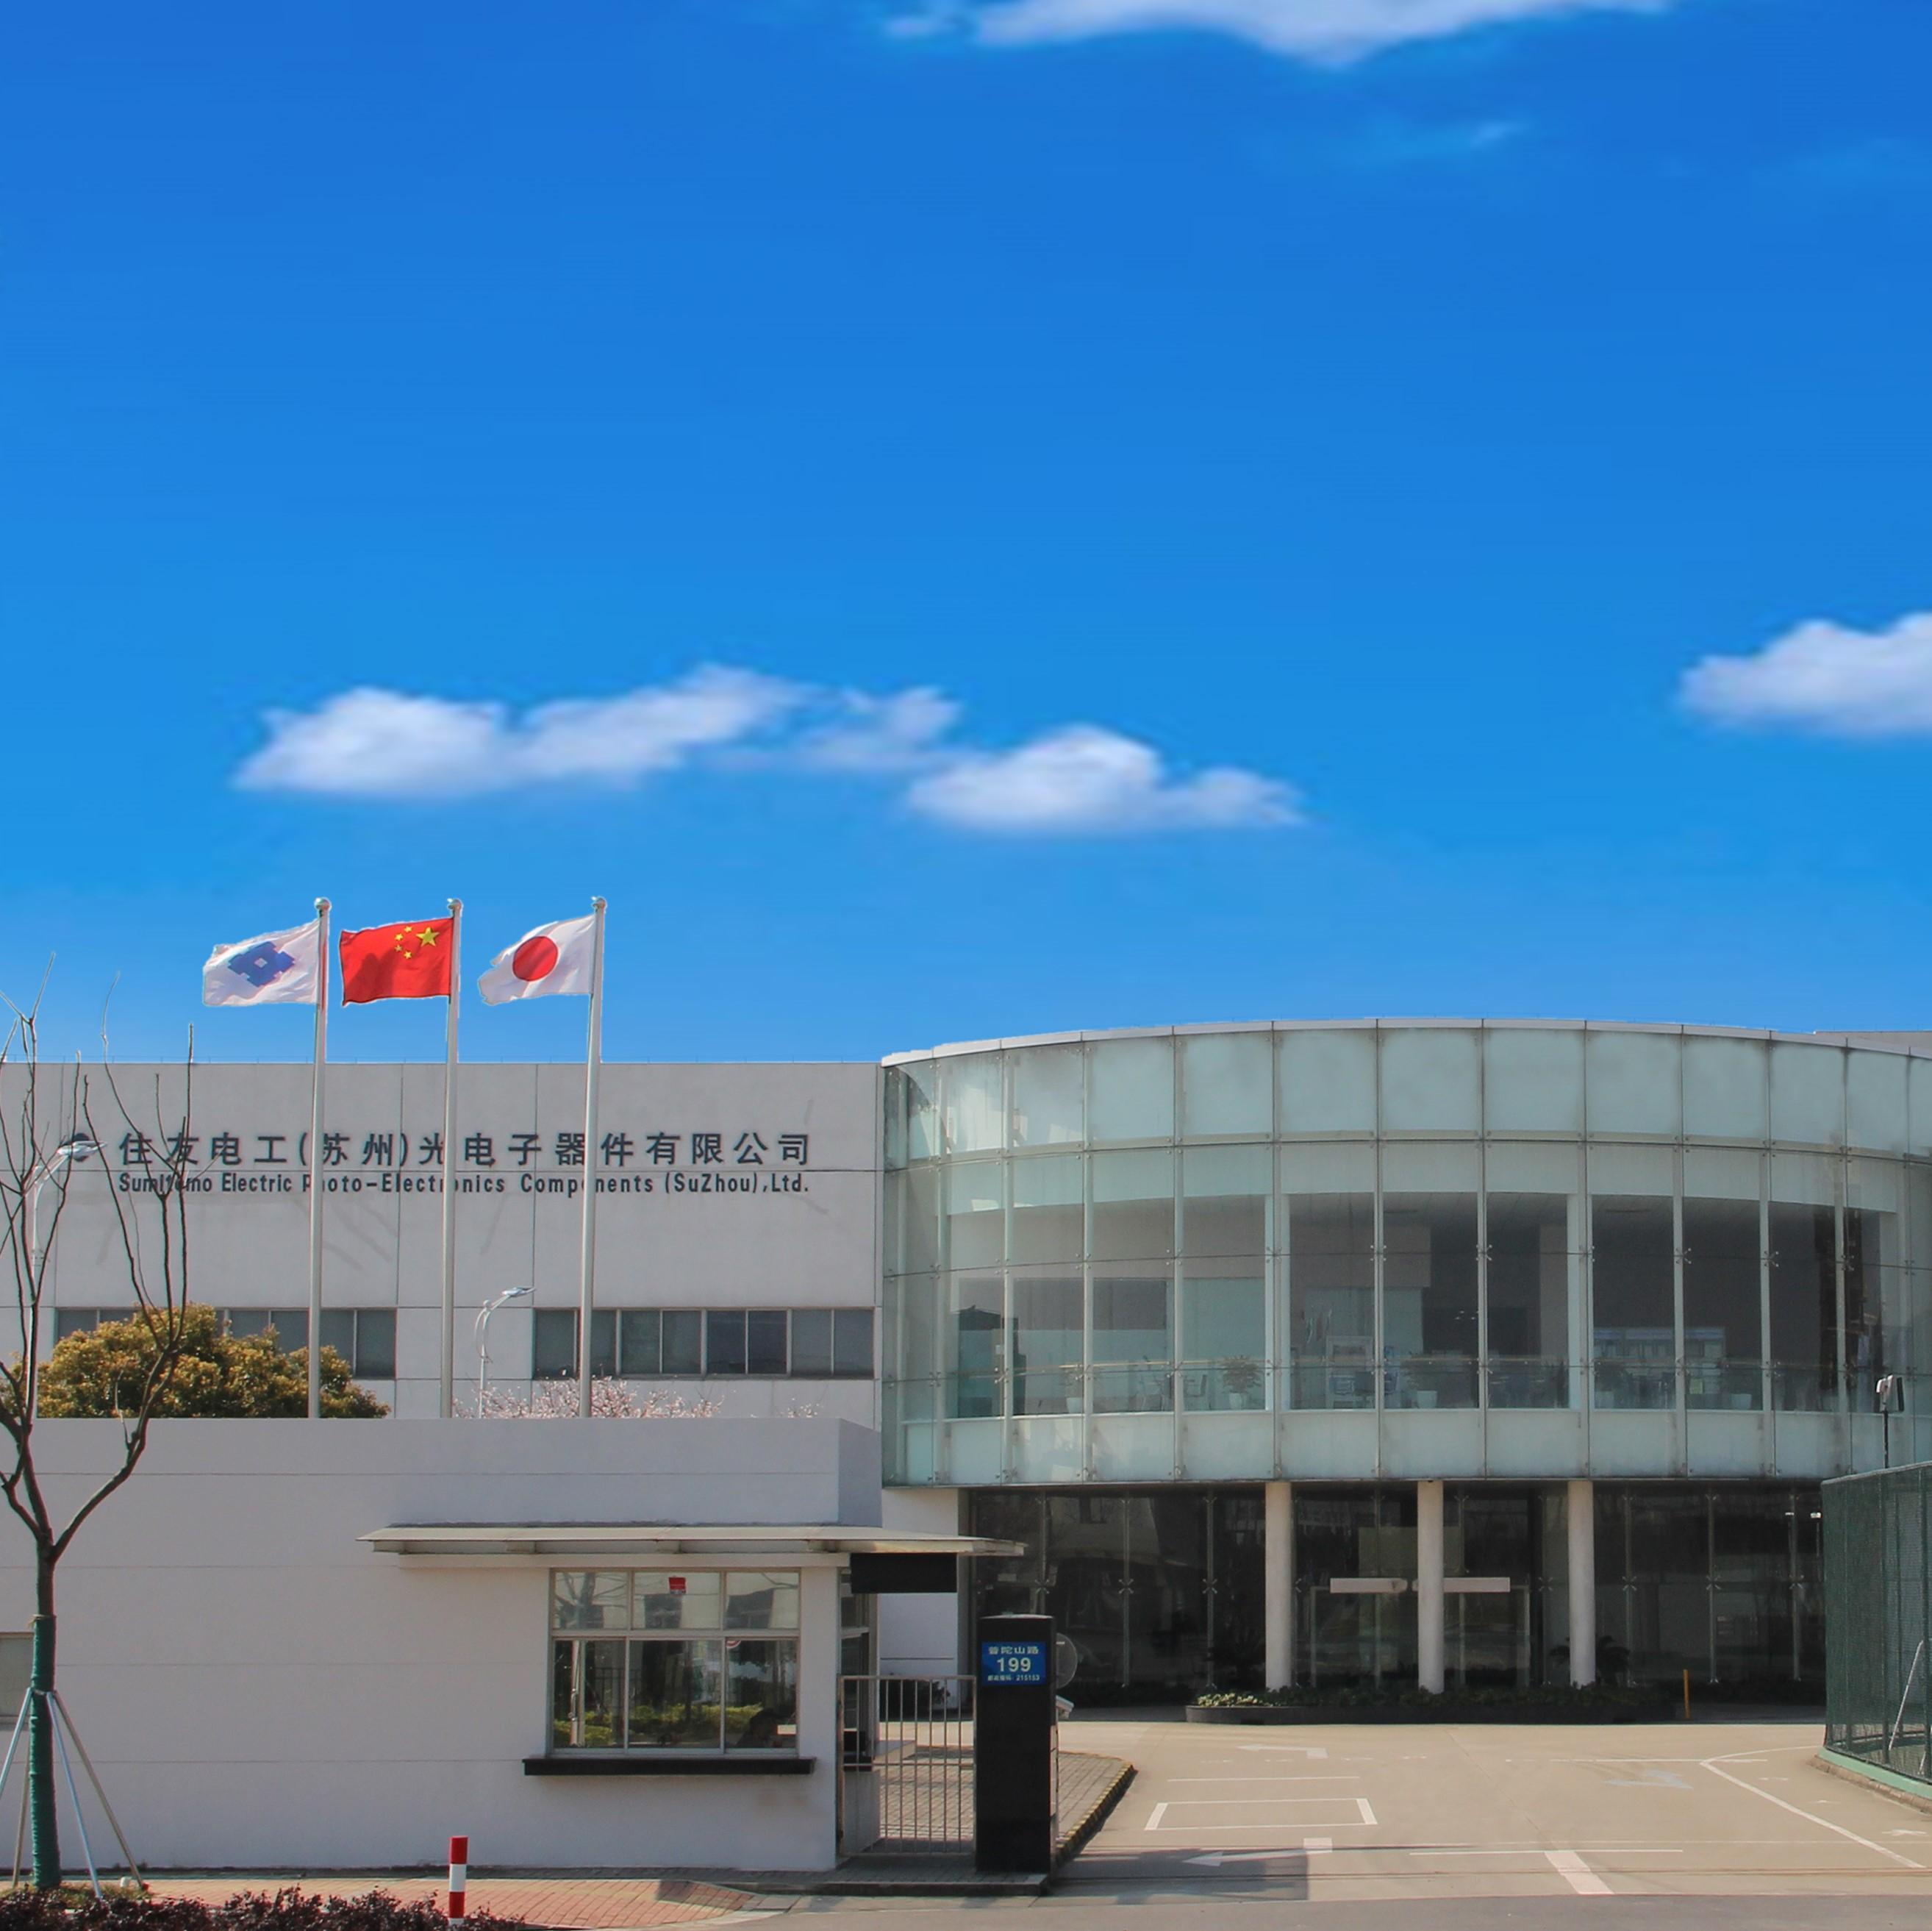 Sumitomo Electric Photo-Electronics Components (Suzhou), Ltd.